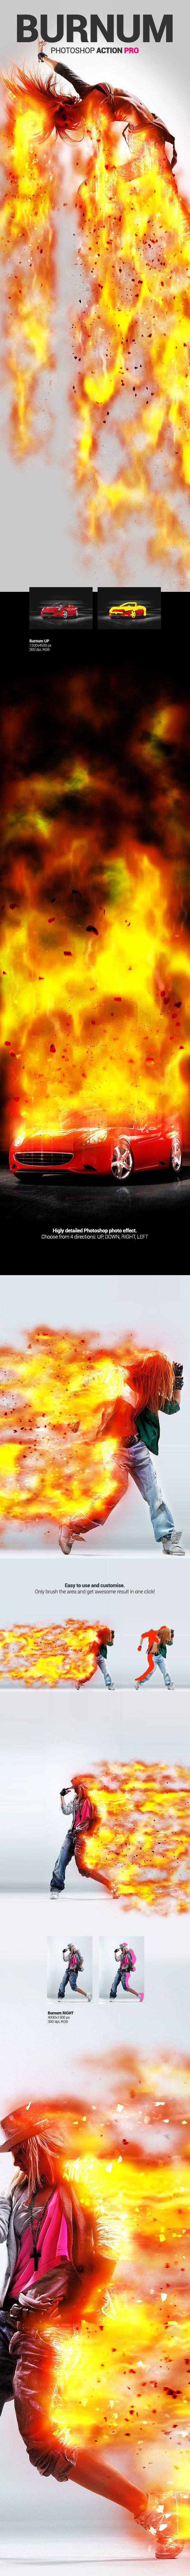 Burning Man - Burnum - Photoshop Action - Photo Effects Actions